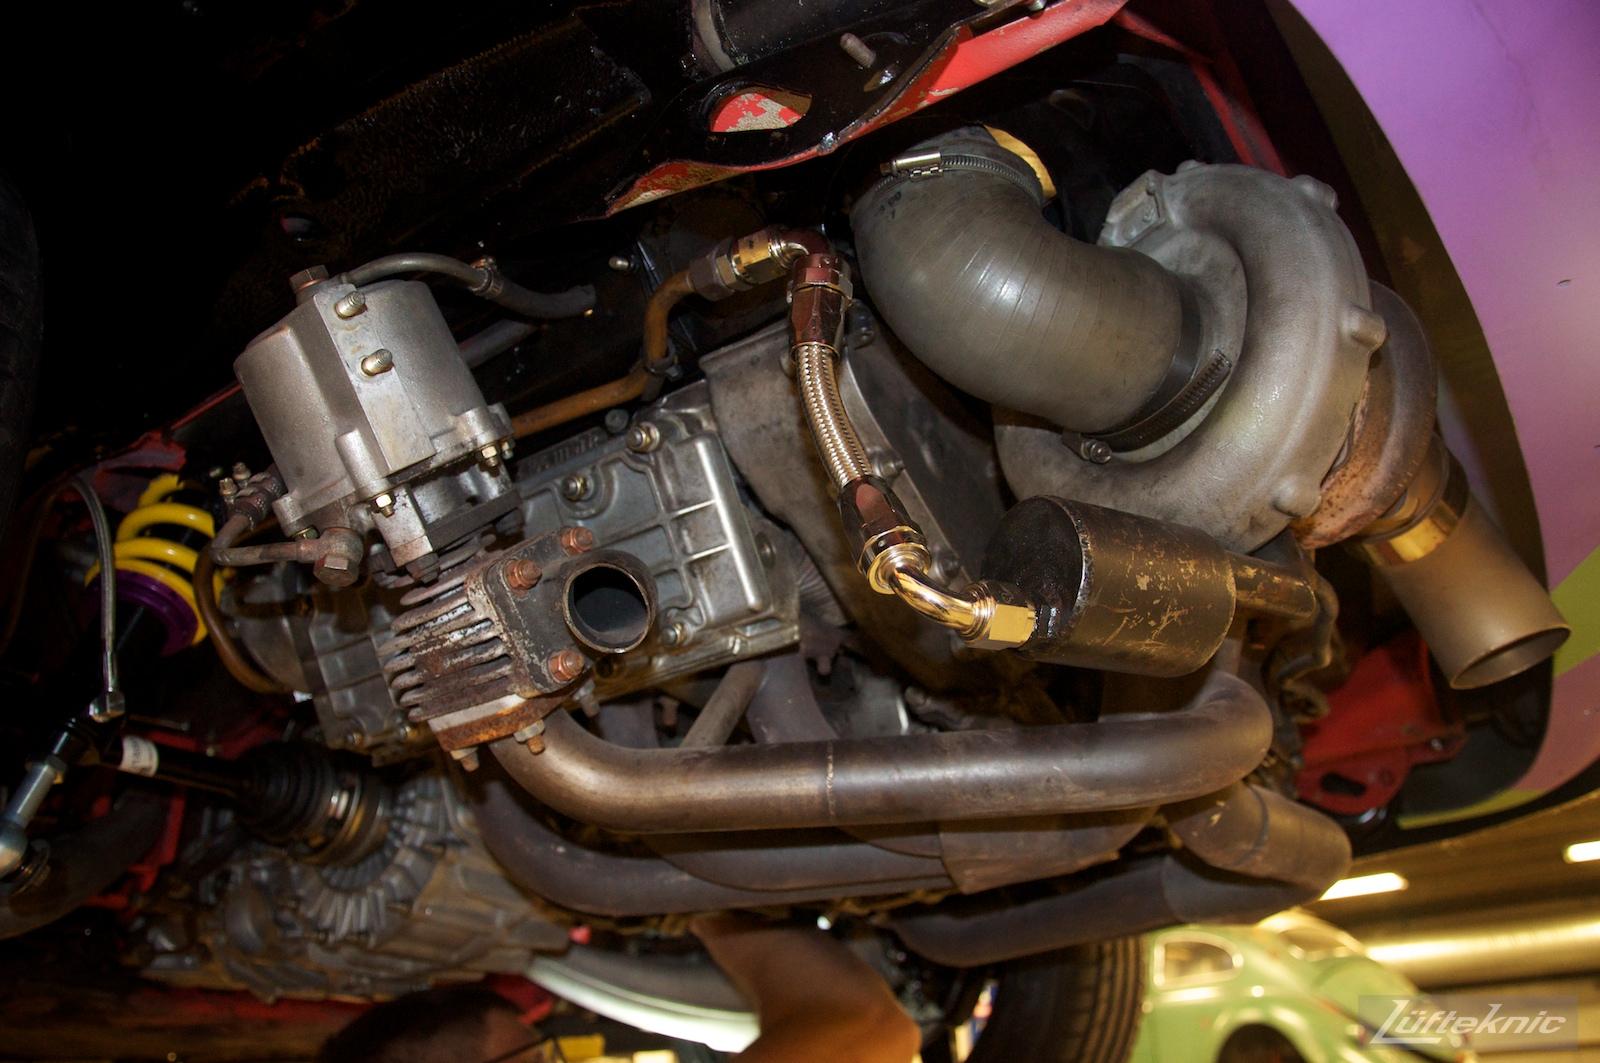 Lüfteknic #projectstuka Porsche 930 Turbo engine, wastegate and exhaust.